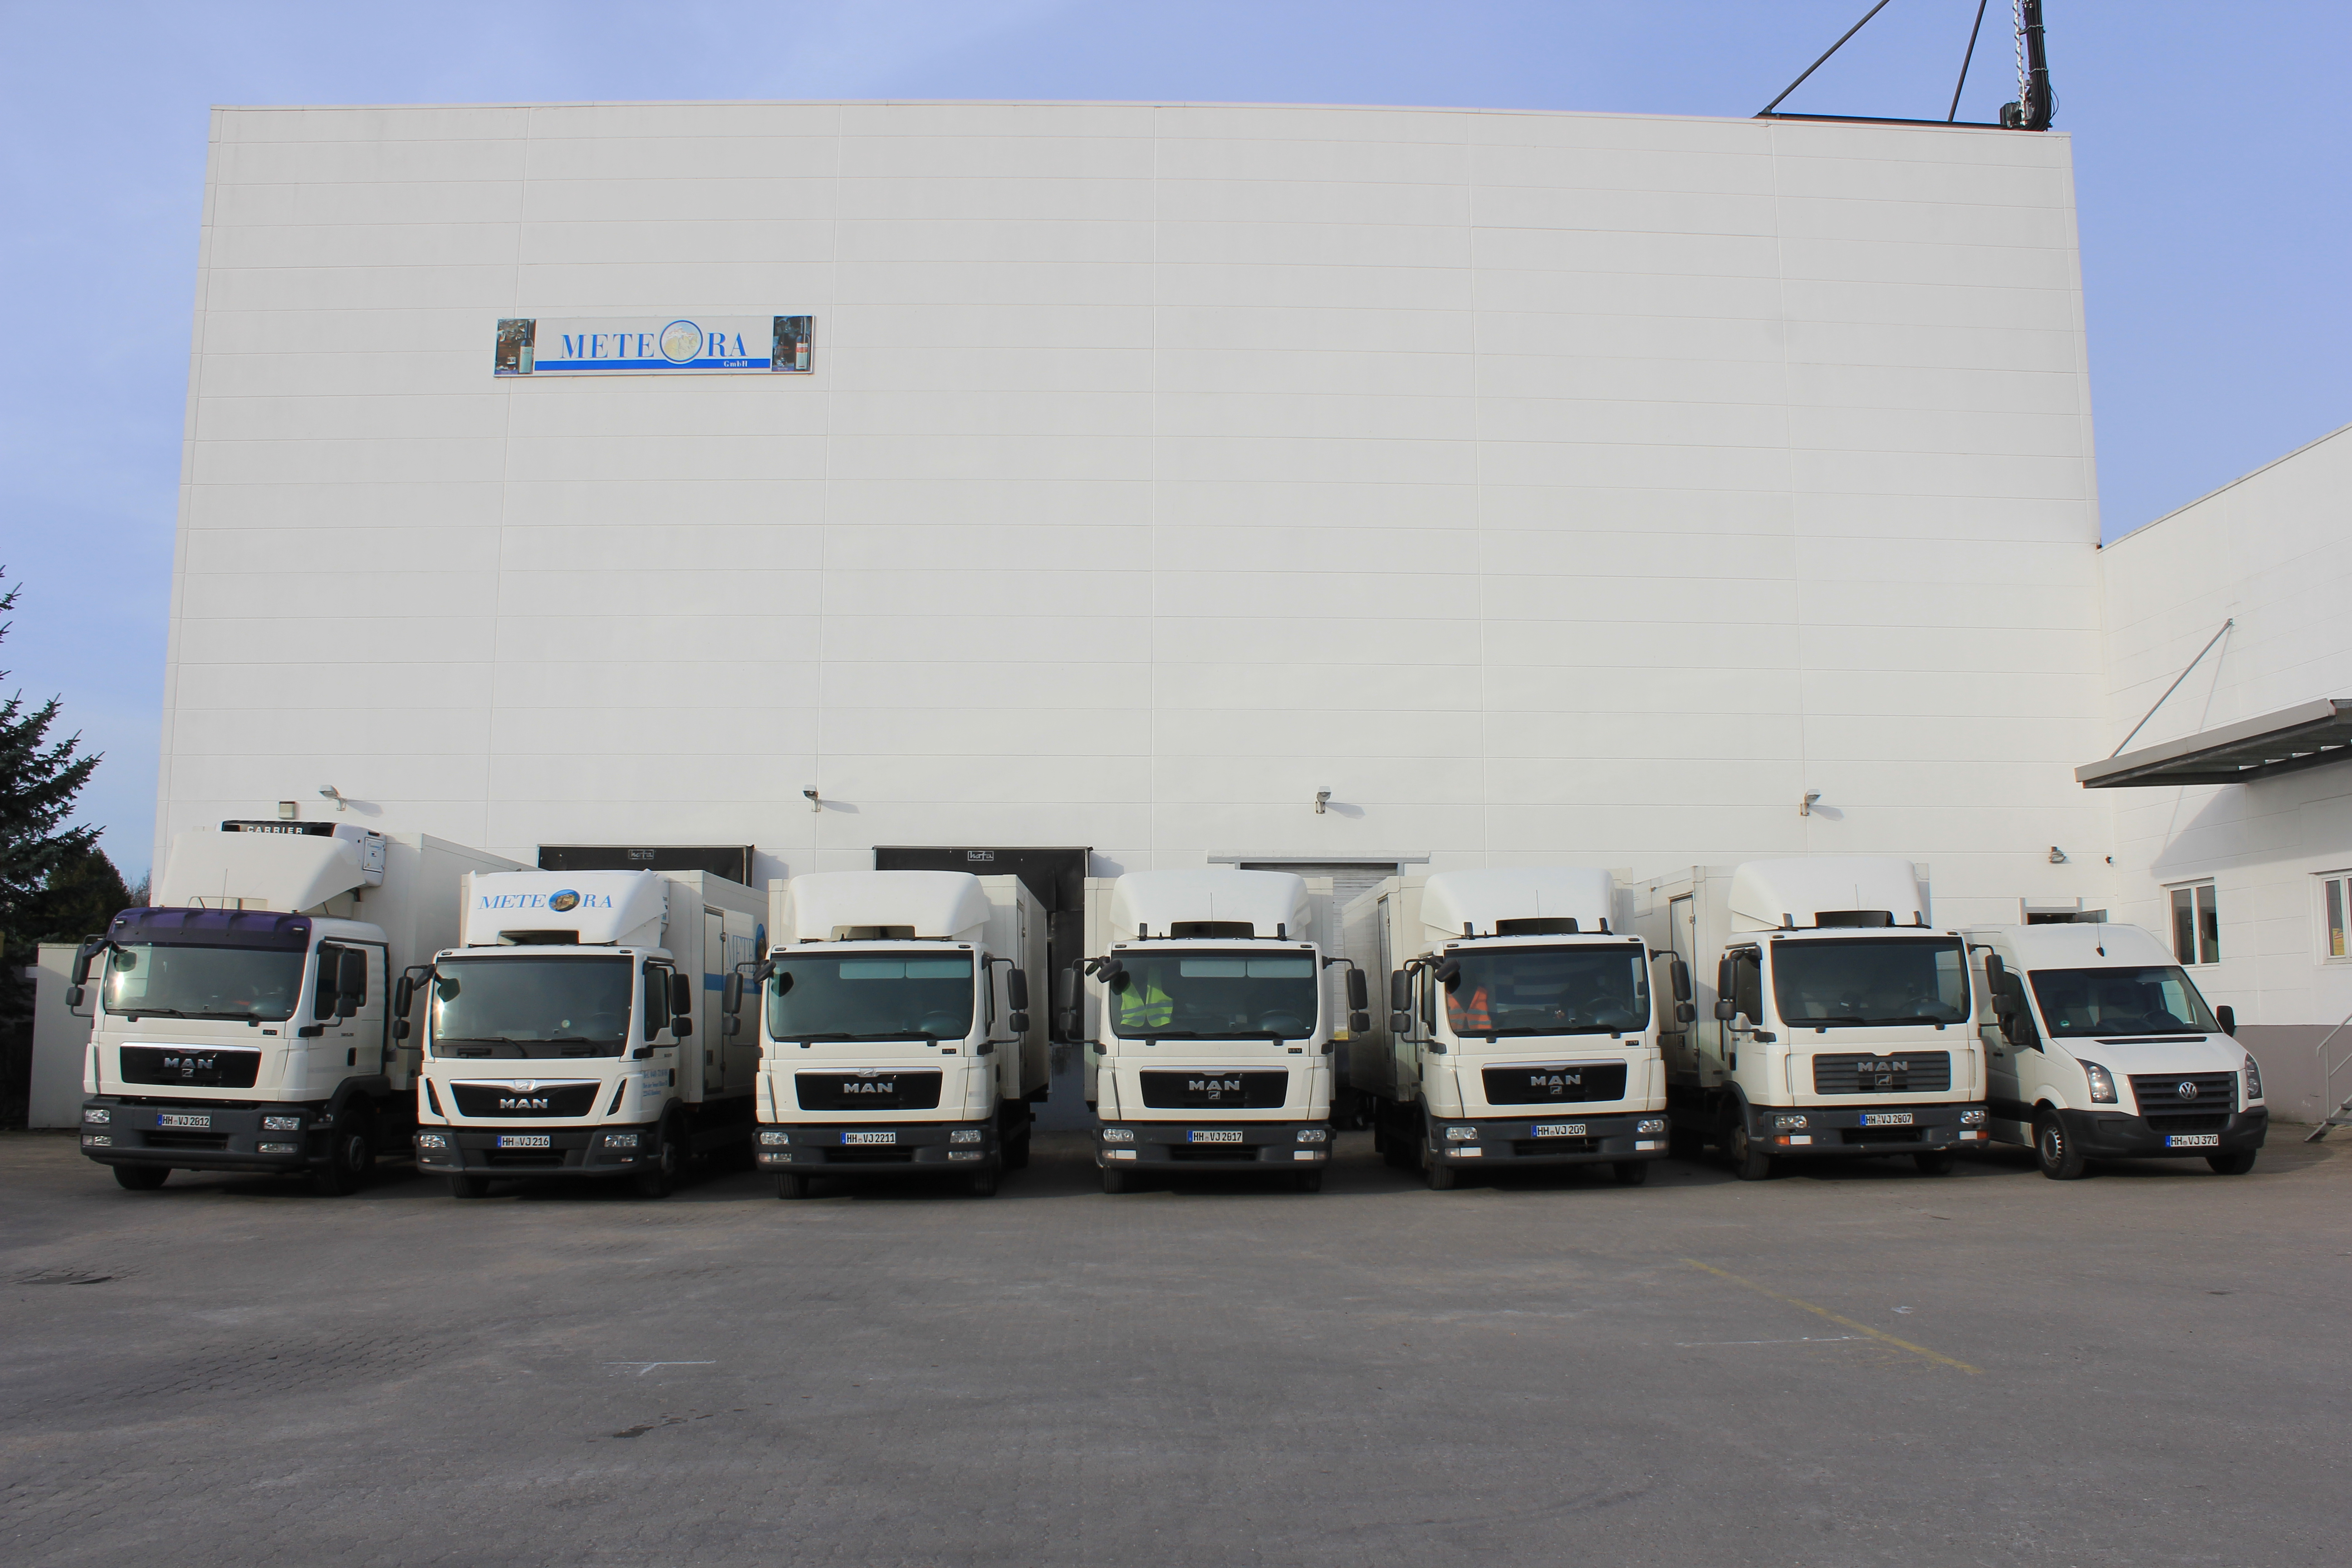 METEORA GmbH - Ελληνικά προϊόντα στο Αμβούργο